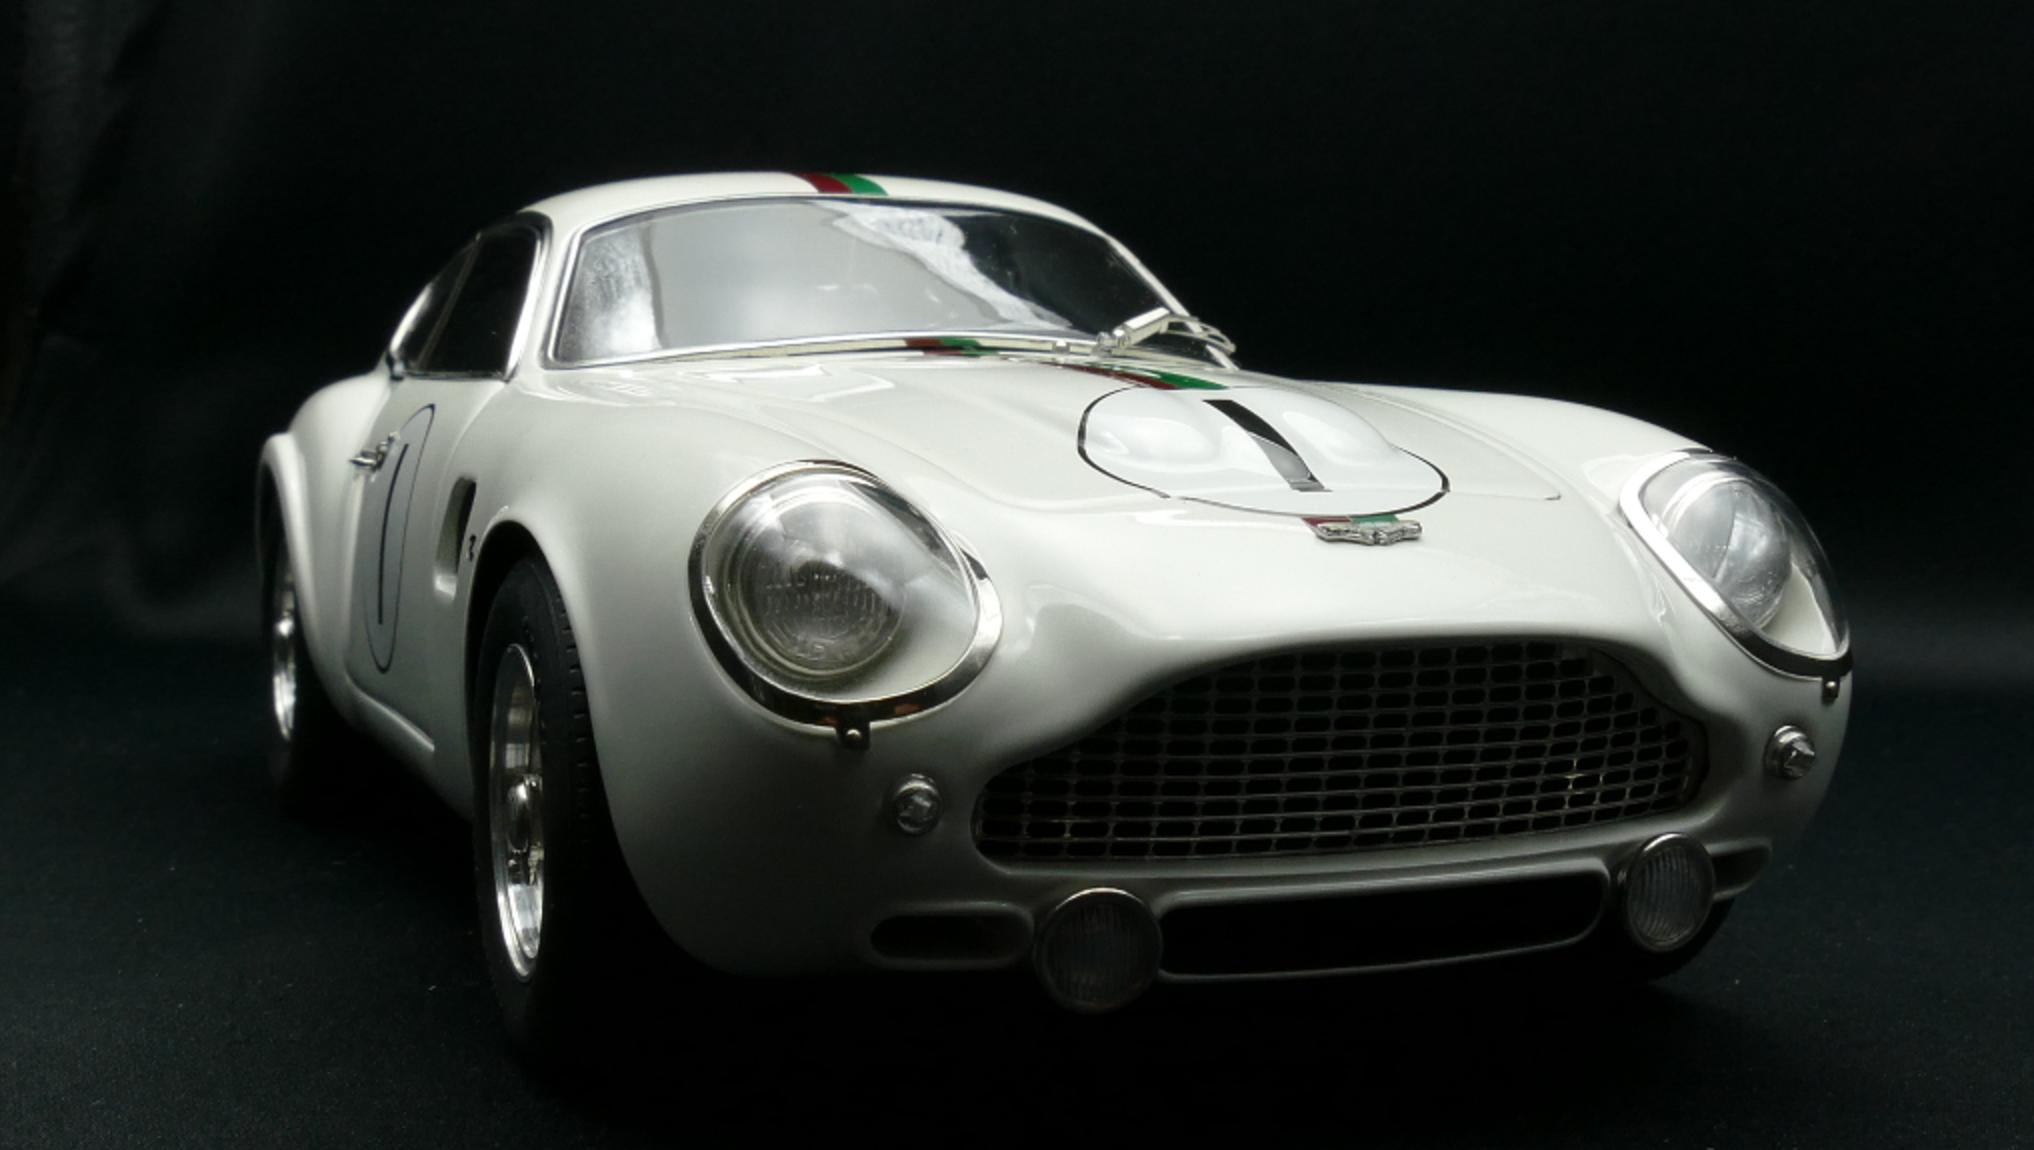 1961 Aston Martin Db4 Gt Zagato By Cmc 1 18 Scale Choice Gear